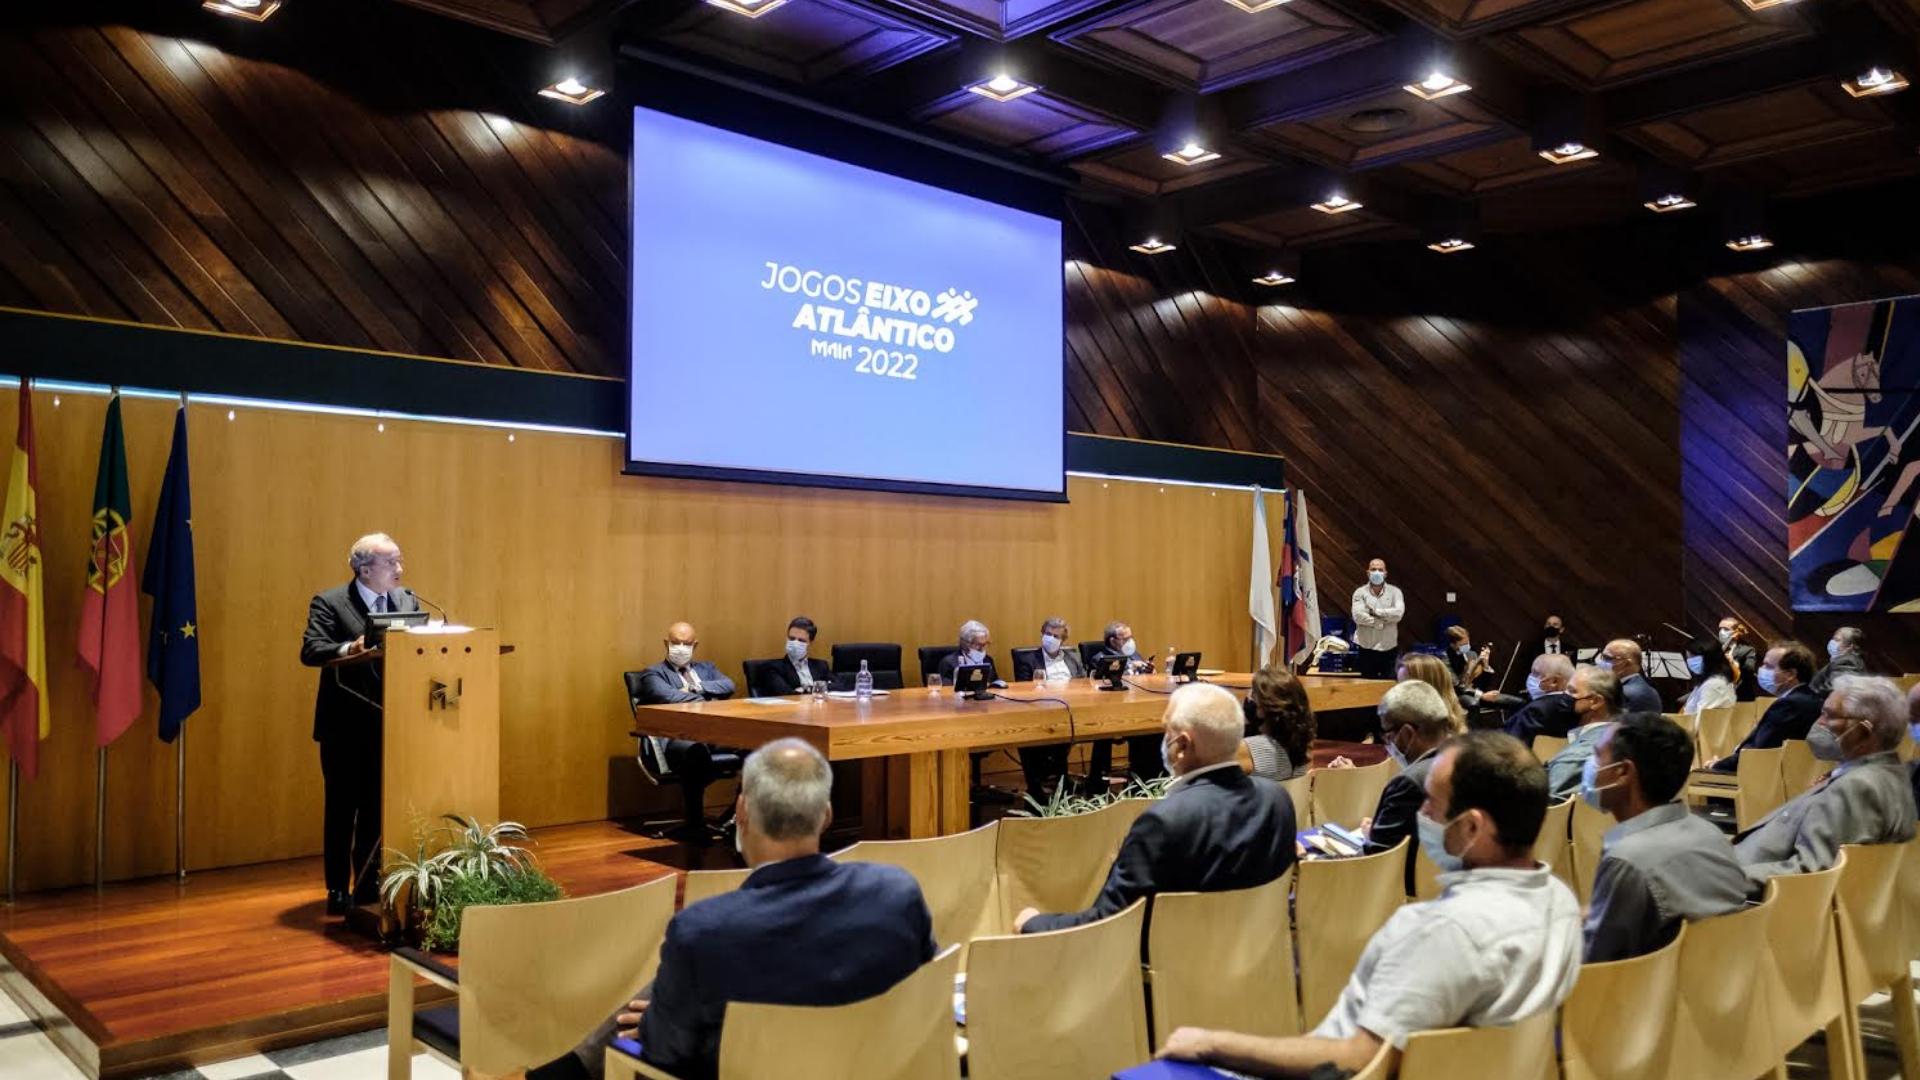 Câmara da Maia recebe bandeira dos Jogos do Eixo Atlântico 2022